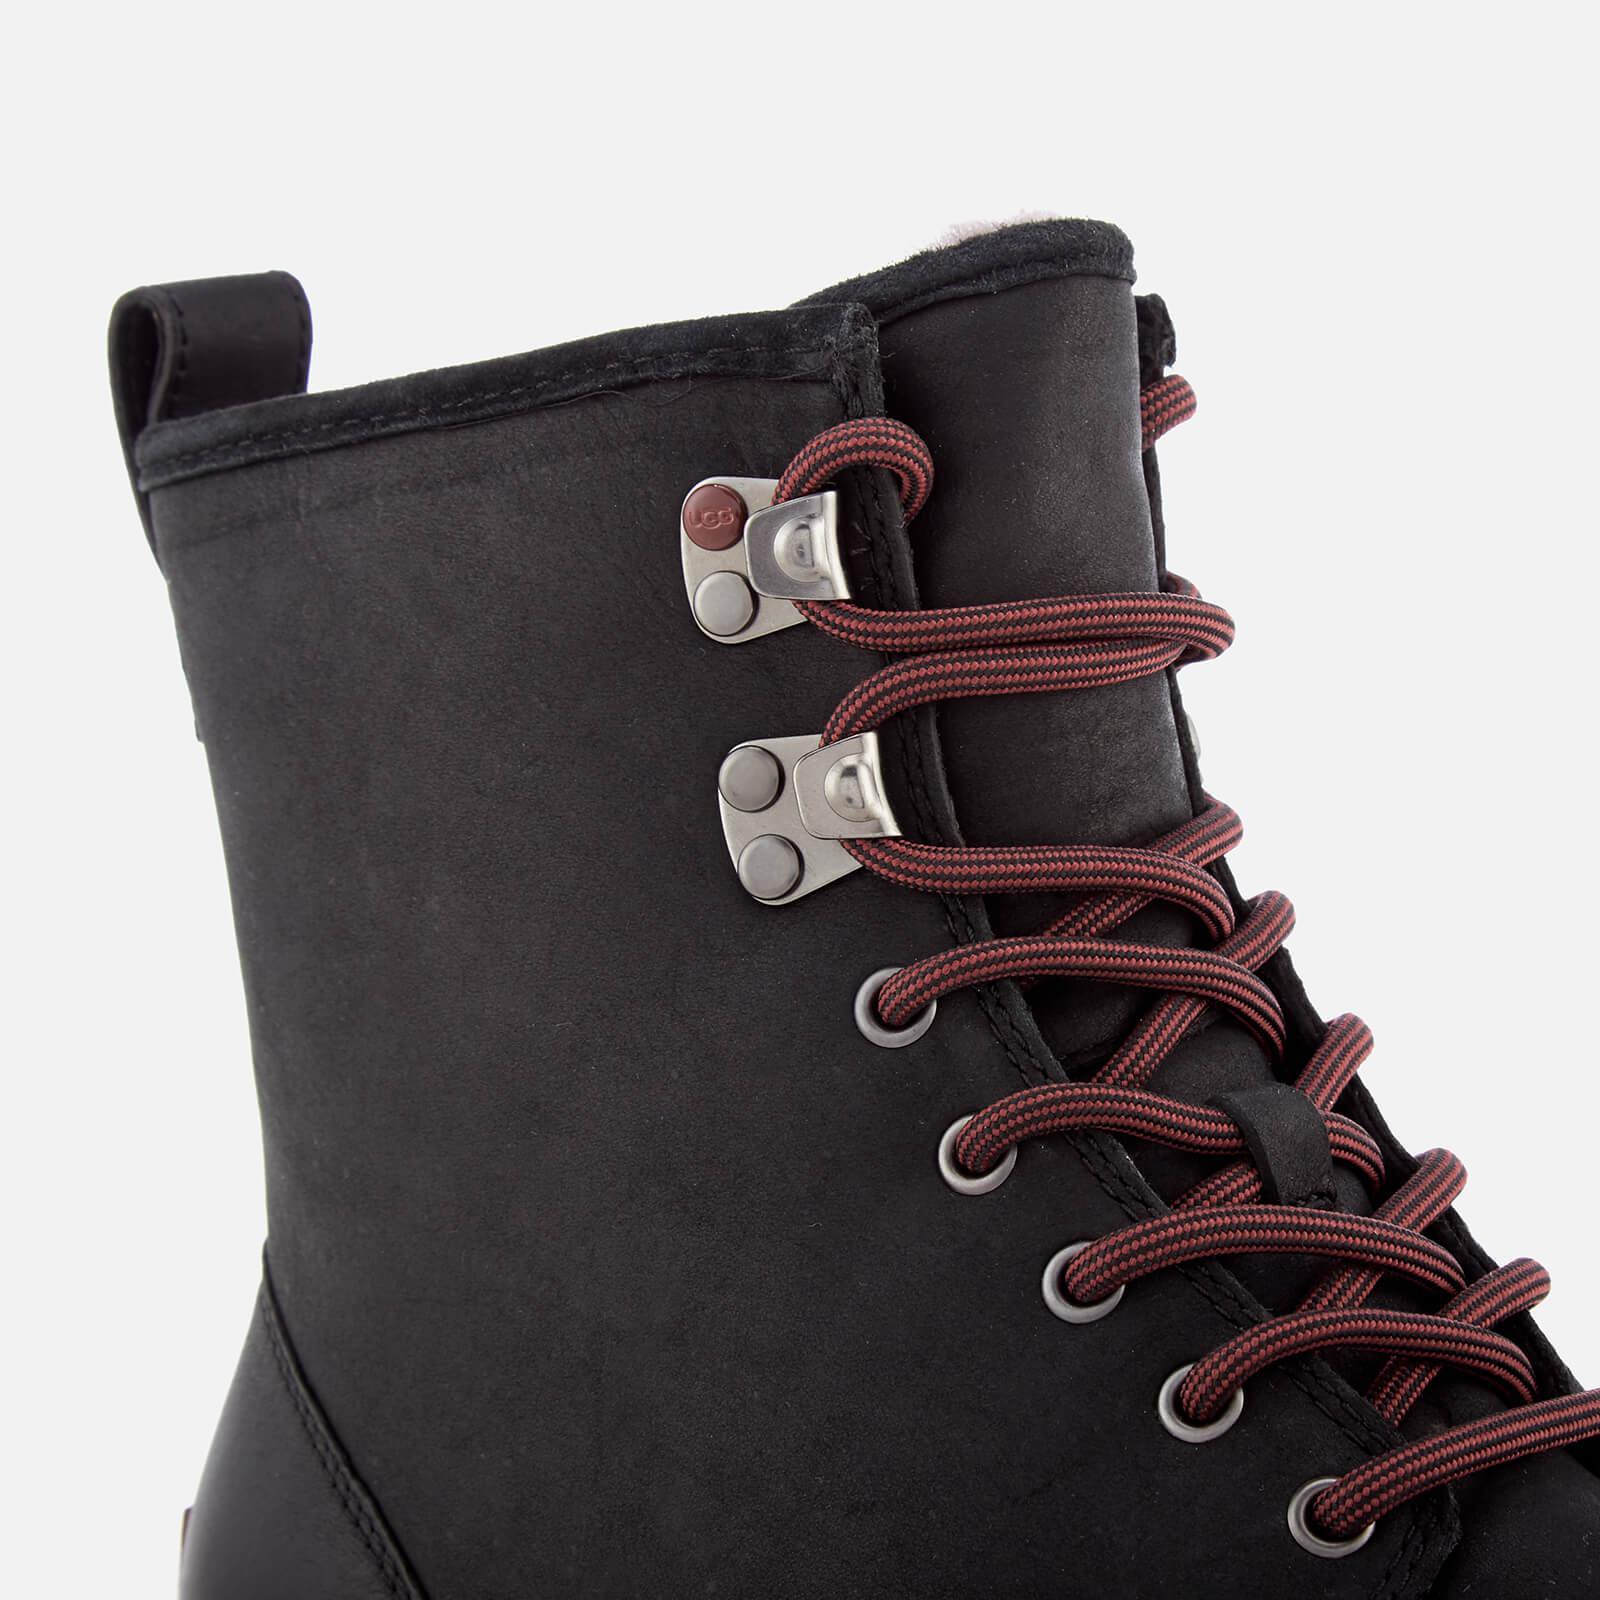 dfc1c61f54d Ugg Black Men's Hannen Tl Waterproof Leather Lace Up Boots for men